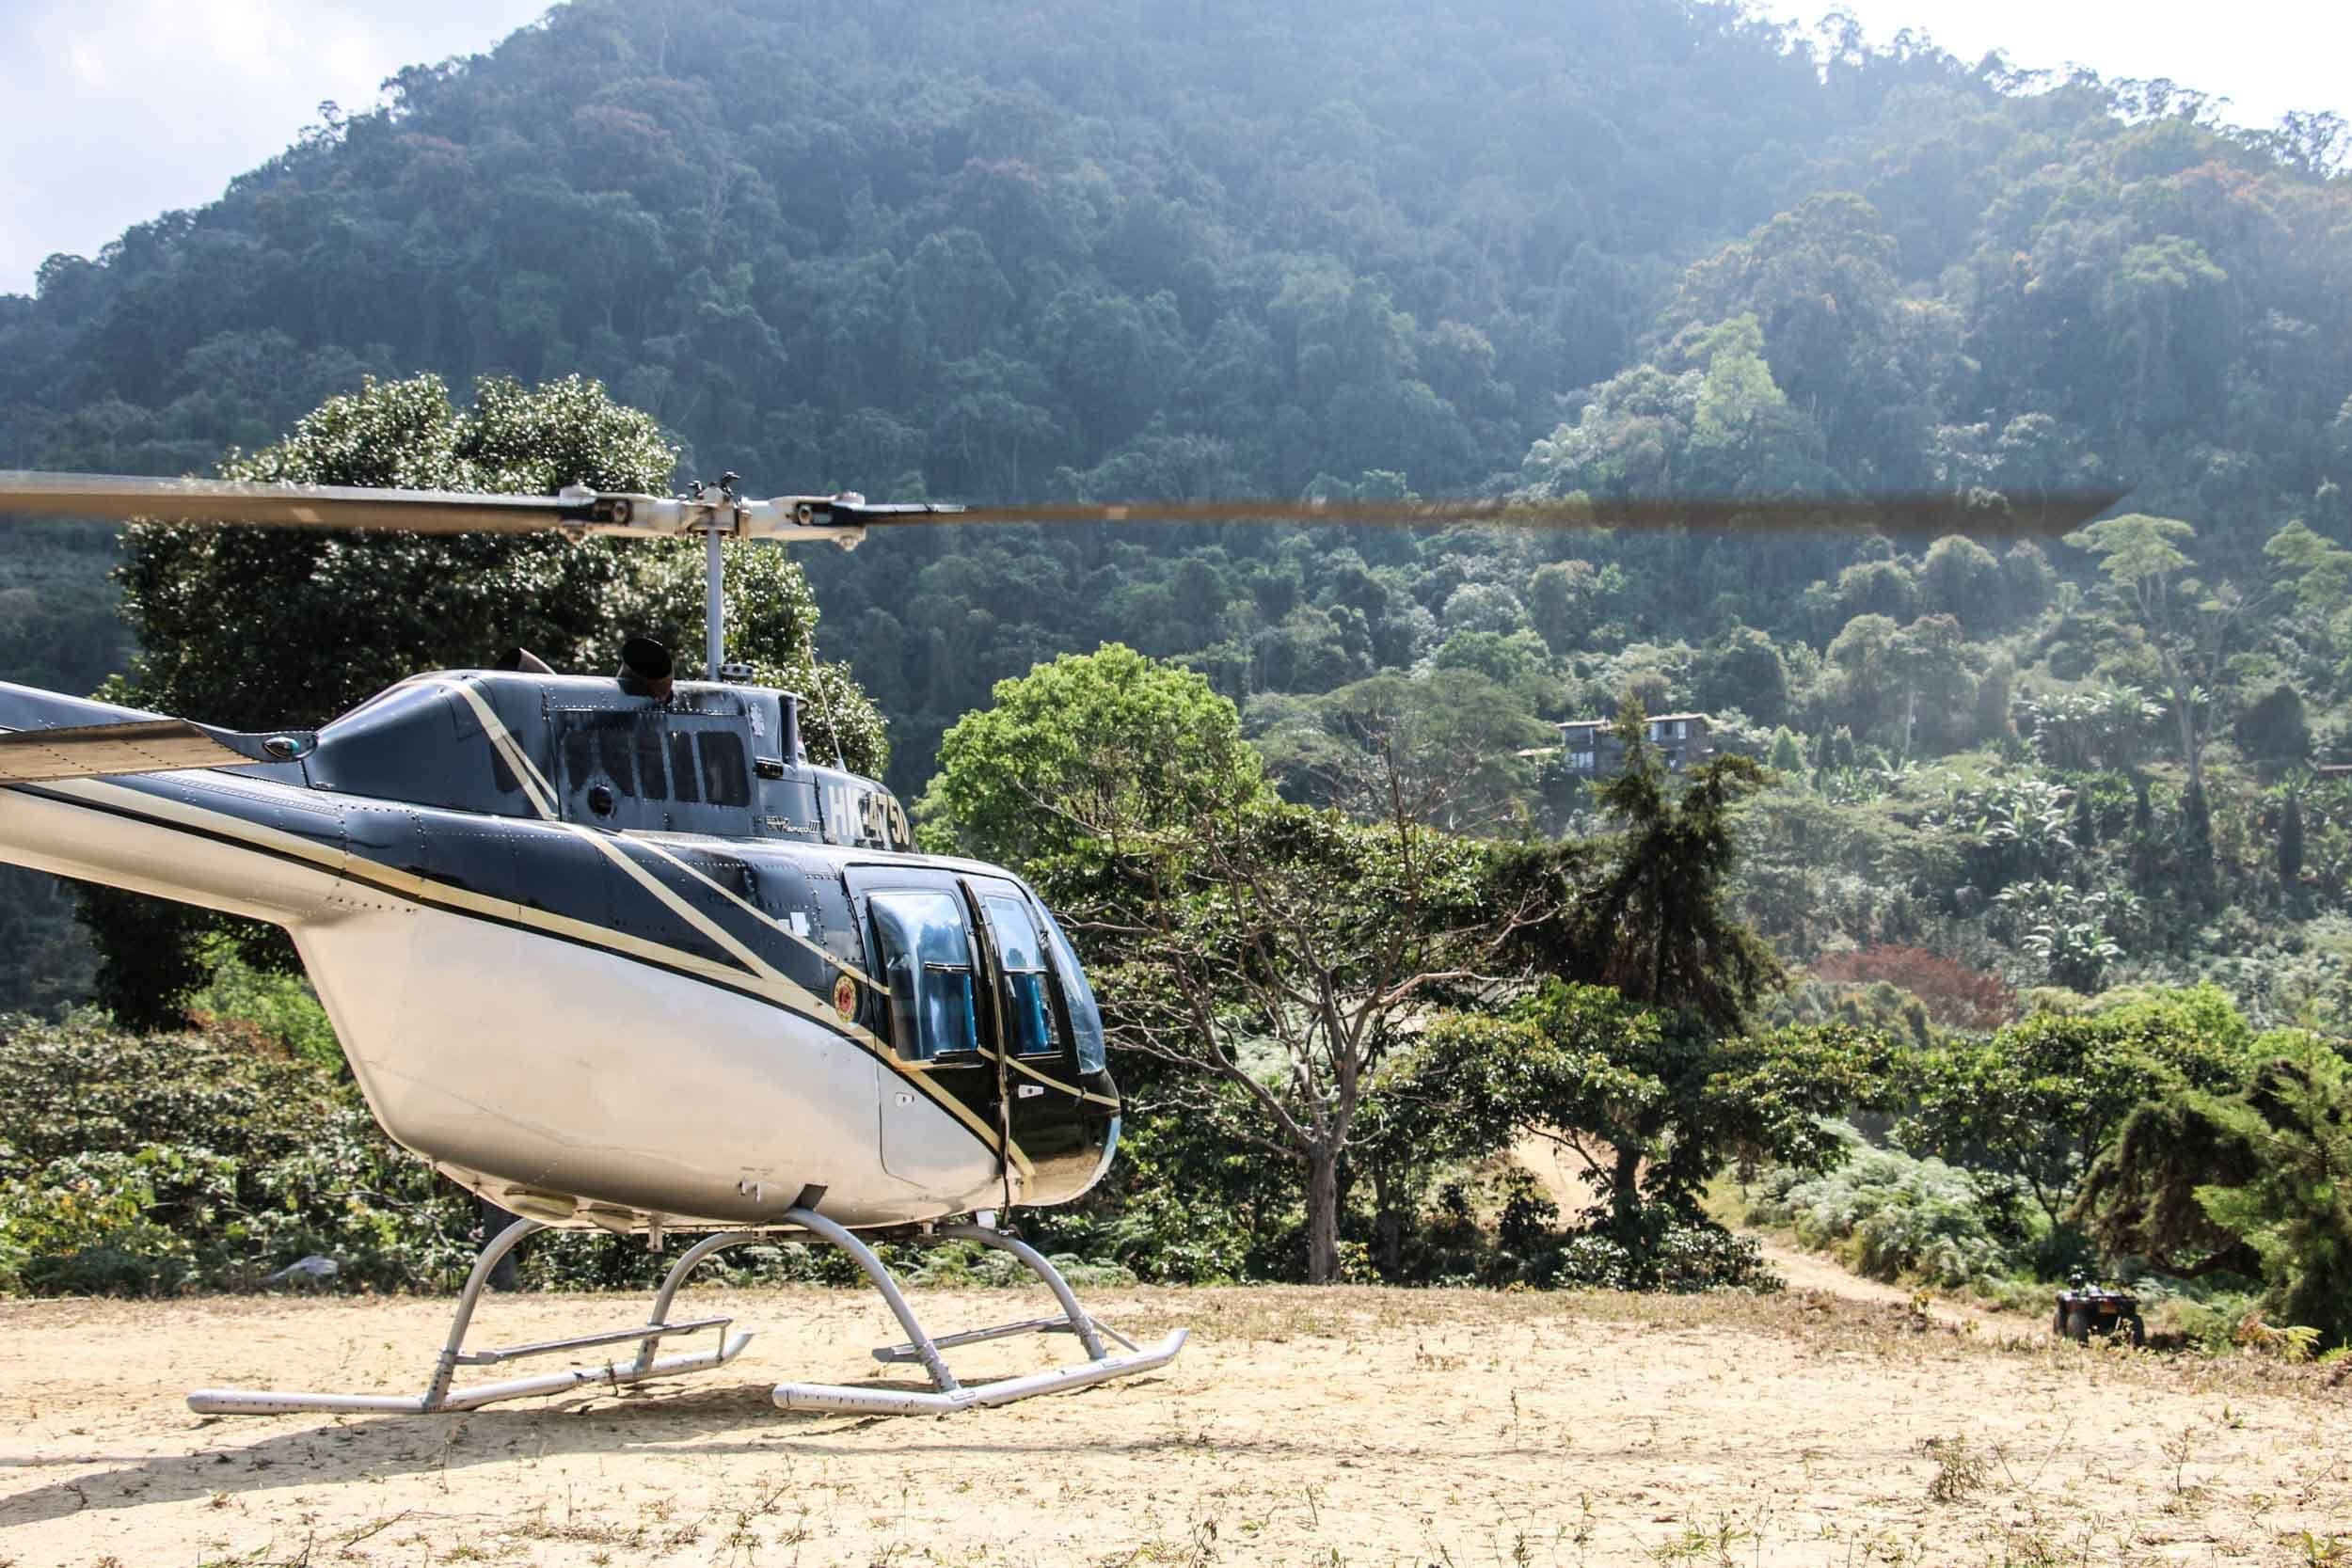 Colombia Heli Sierra Nevada Jungle